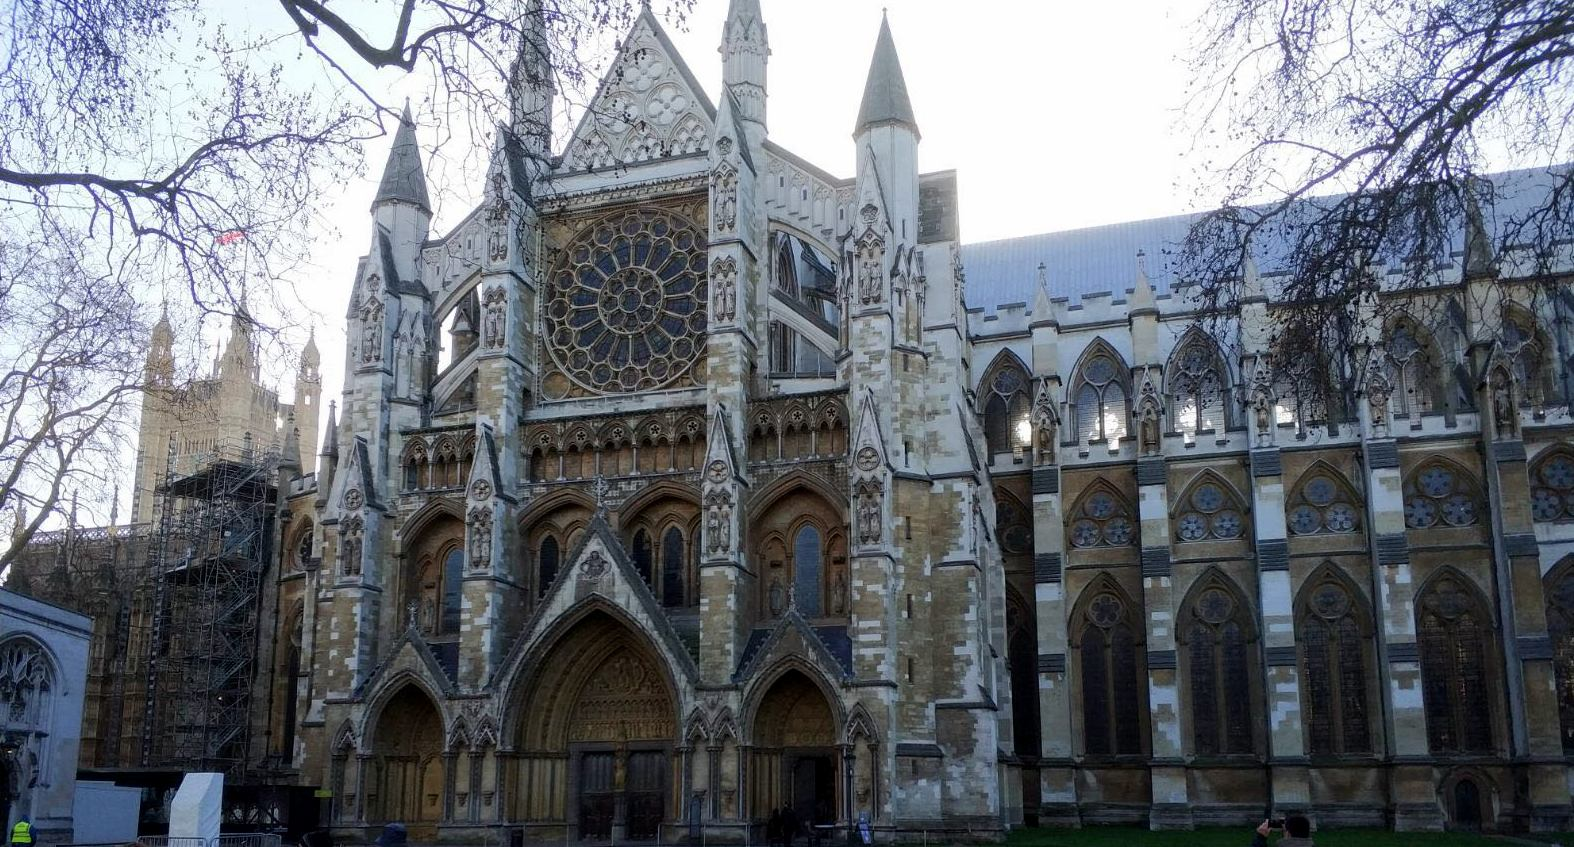 Abadía de Westminster. Visitar Londres